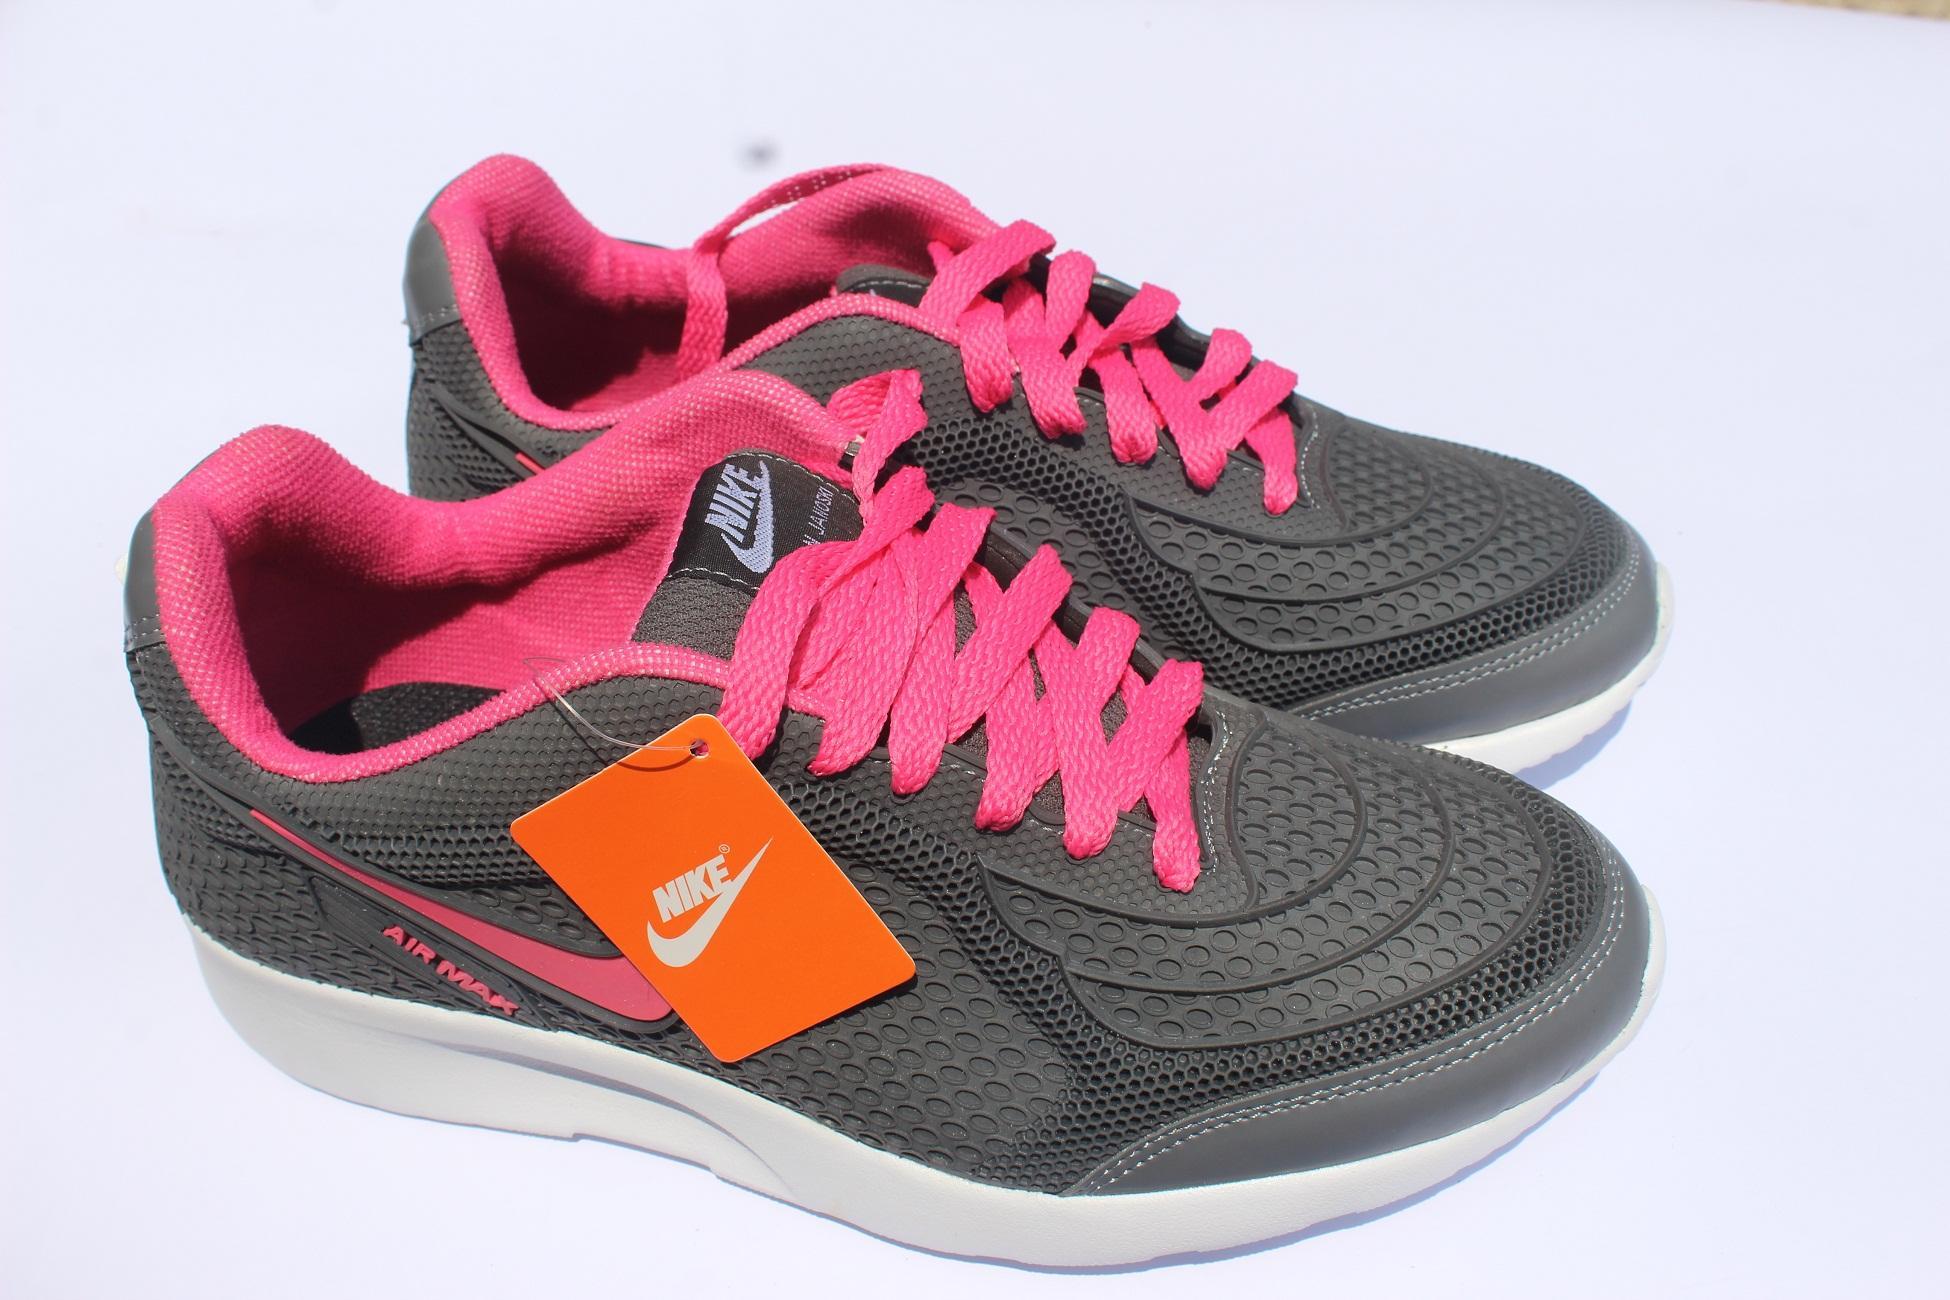 Sepatu pria wanita   sepatu casual murah   sepatu sport promo   sepatu  kekinian   sepatu 428c8184b5